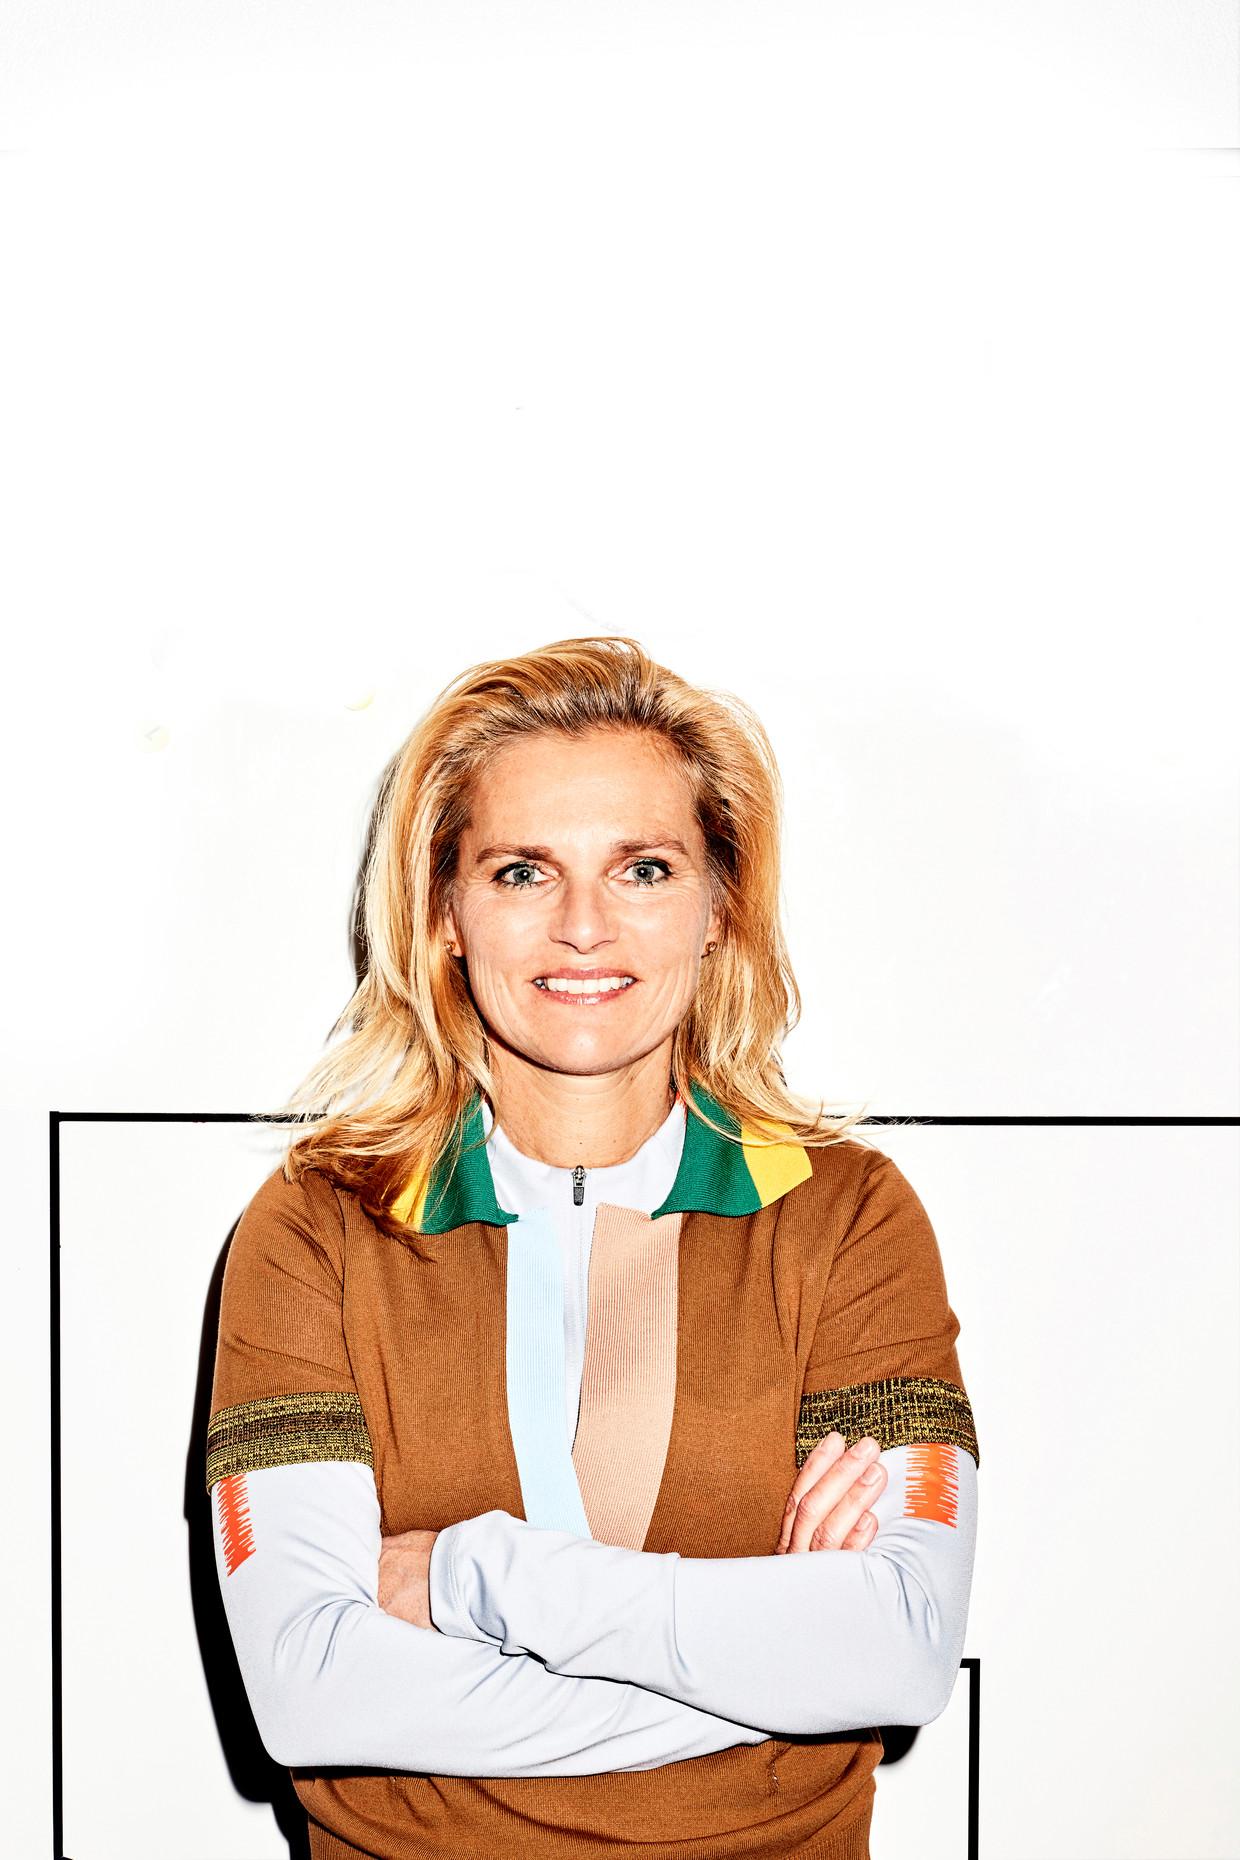 Sarina Wiegman. Beeld Valentina Vos